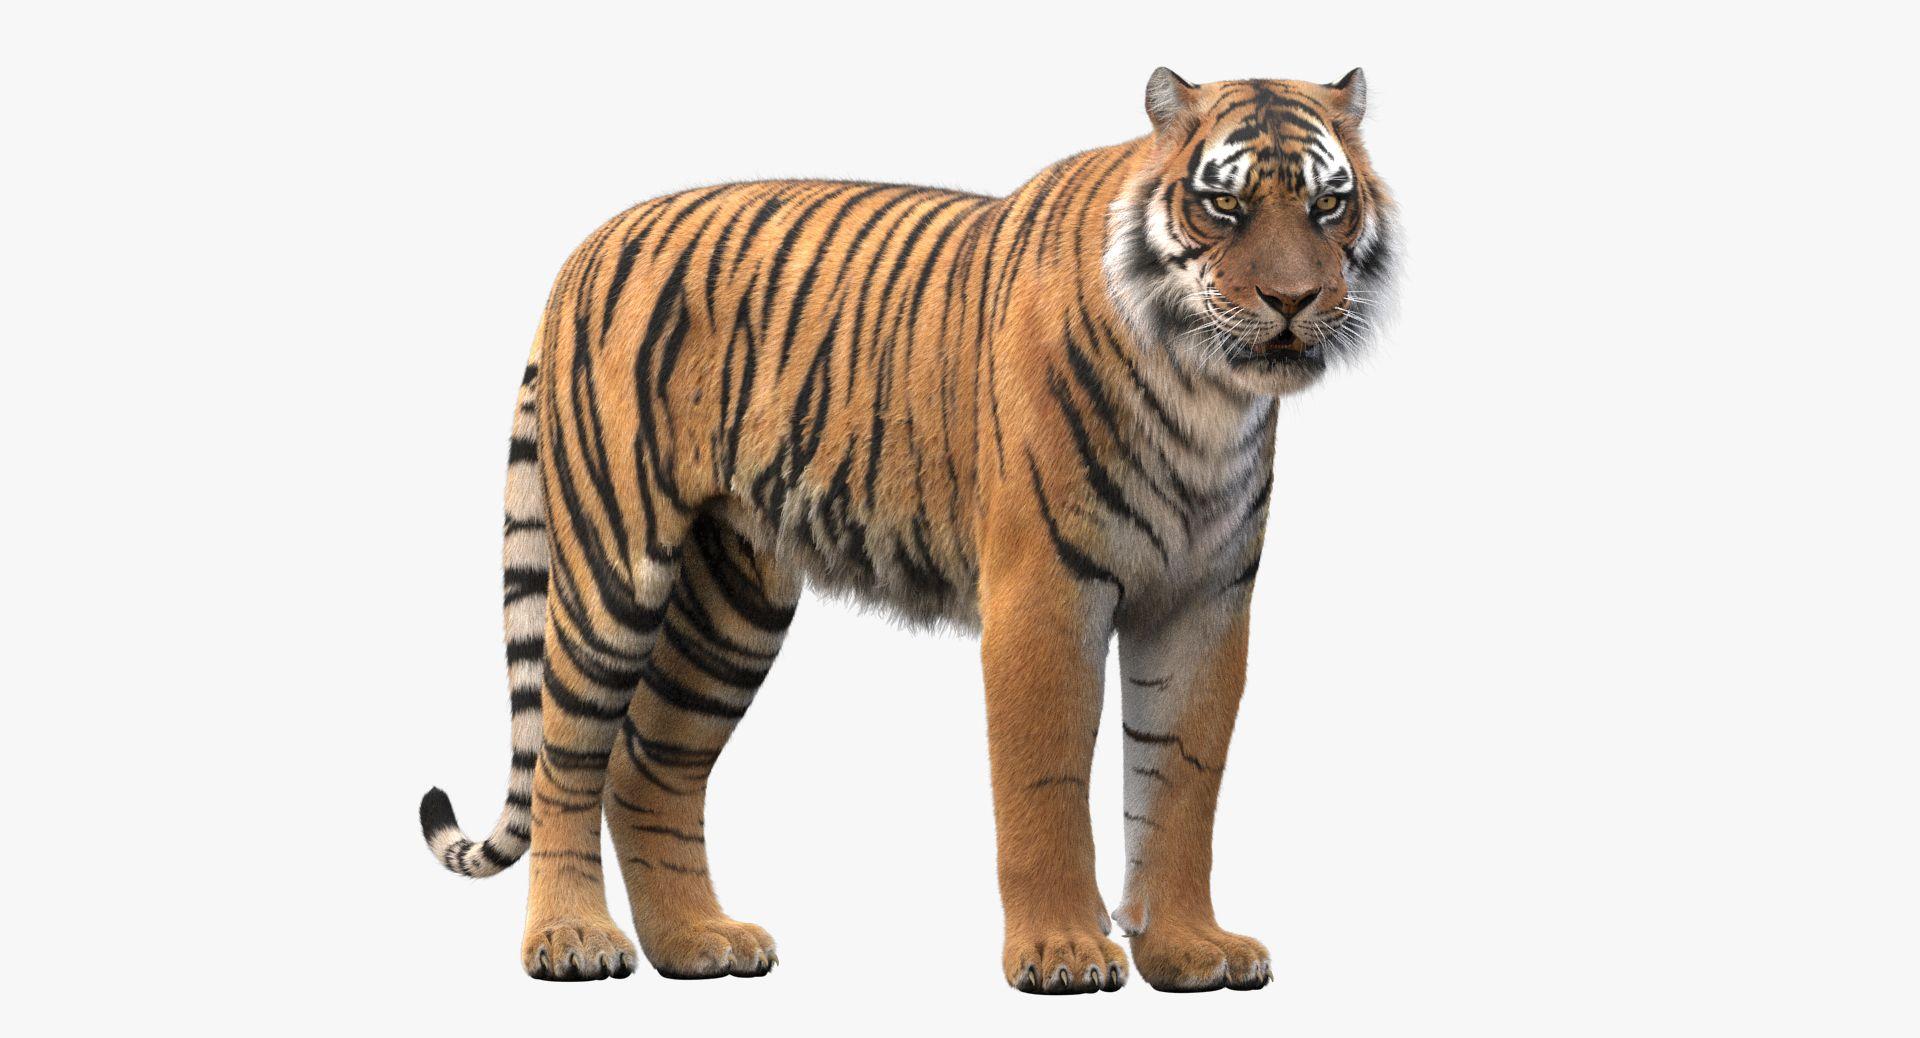 Tiger Rigged Fur 3d Model Tiger Fur Fur Tiger